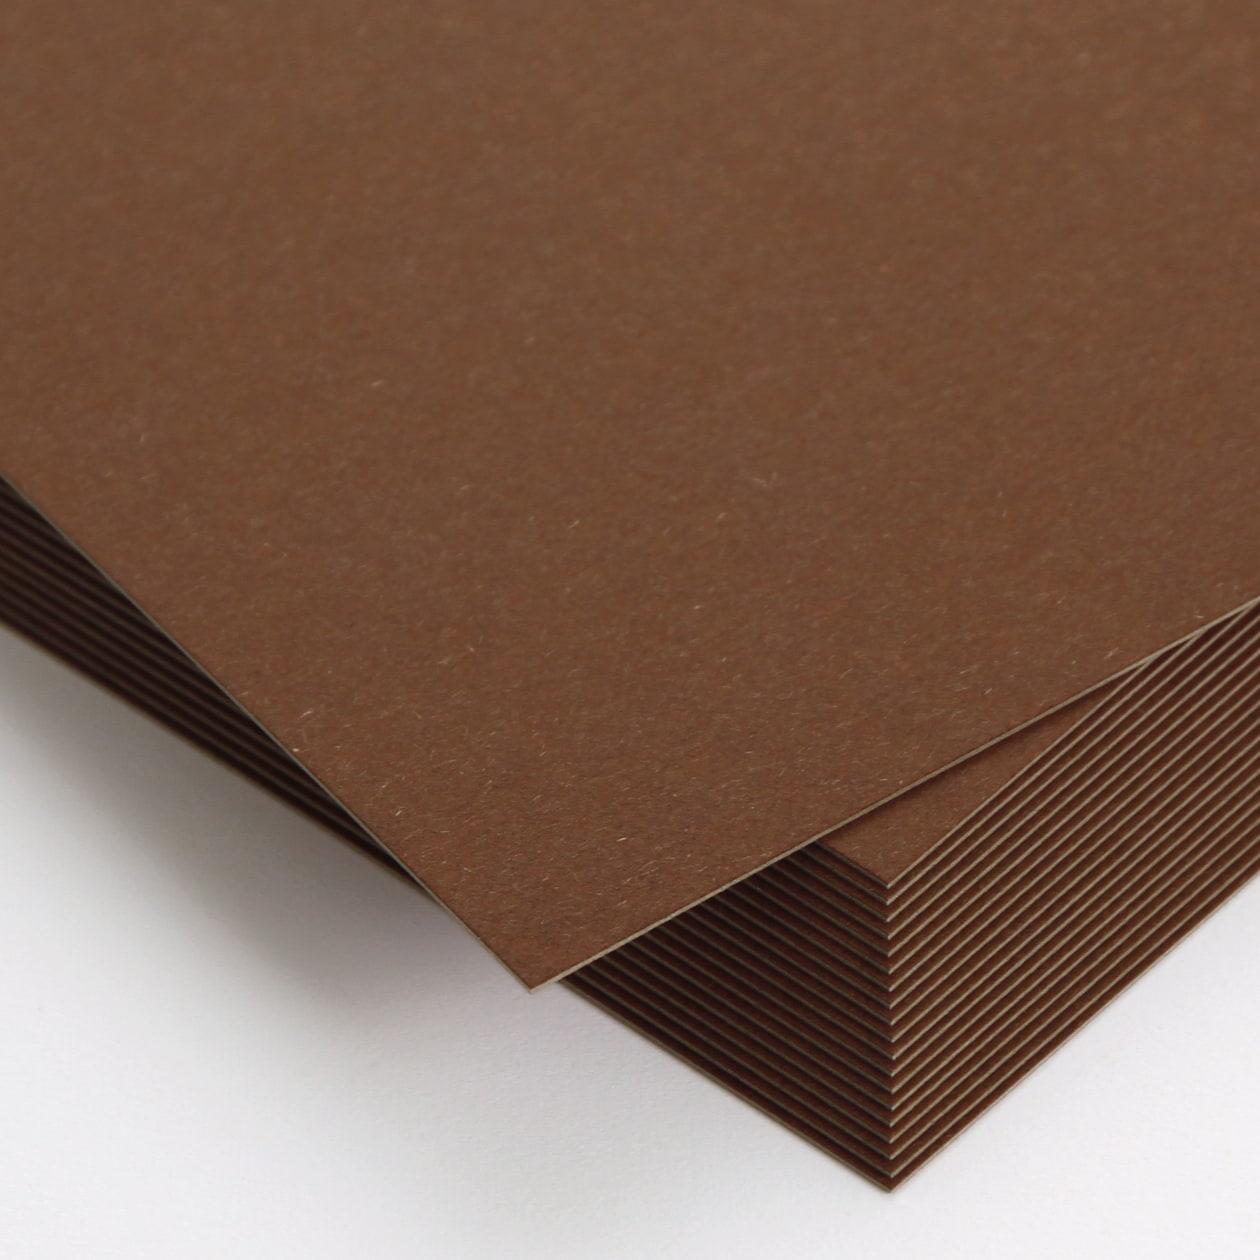 Pカード ボード紙 チョコレート 450g